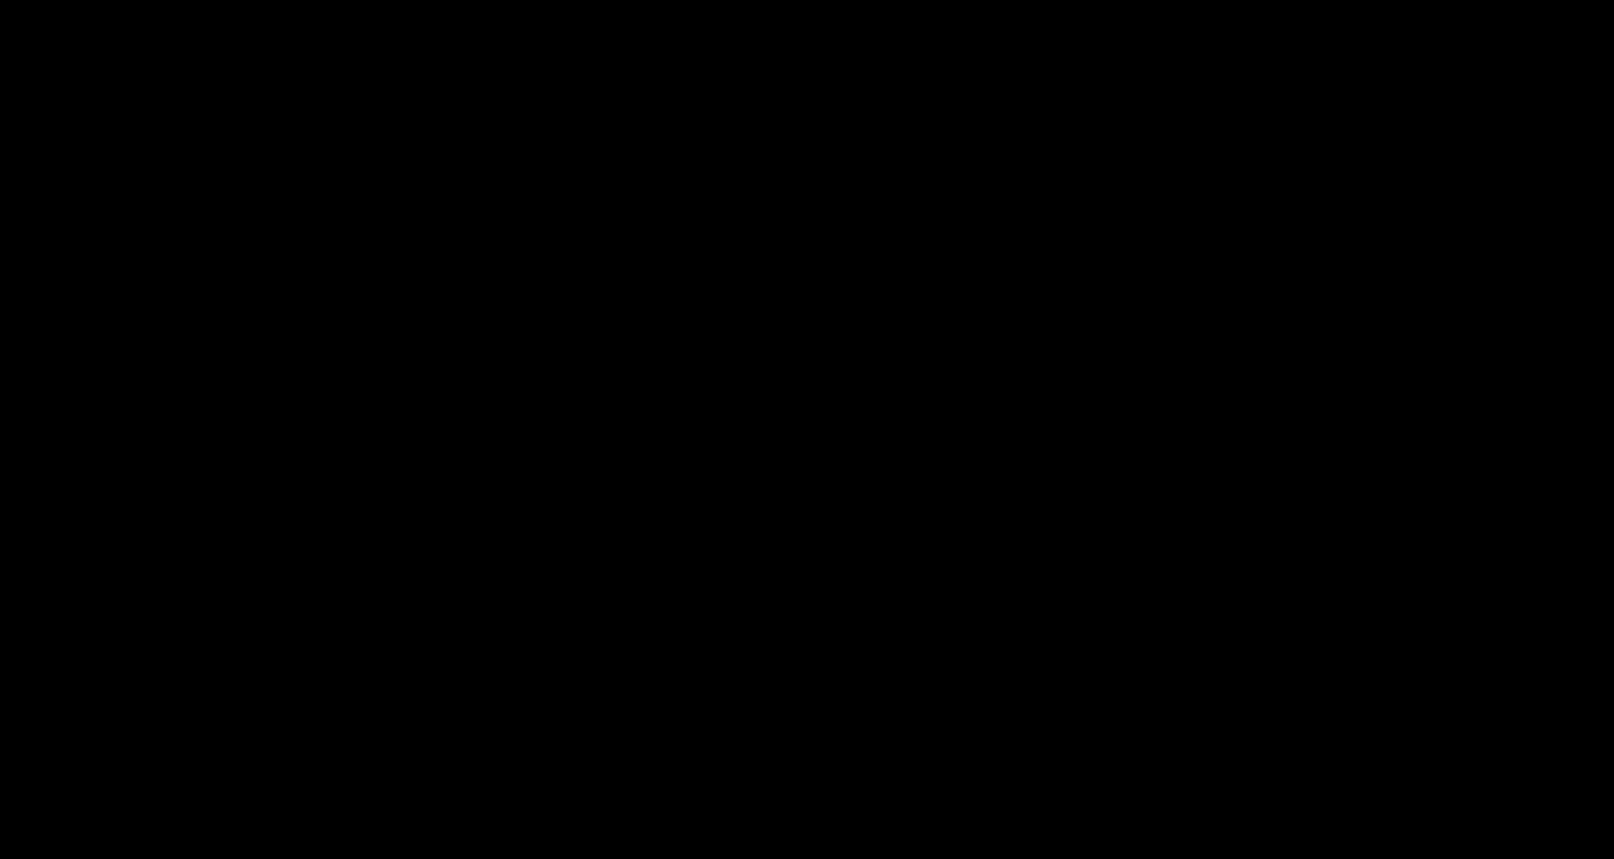 Albuterol Dimer-d<sub>18</sub>